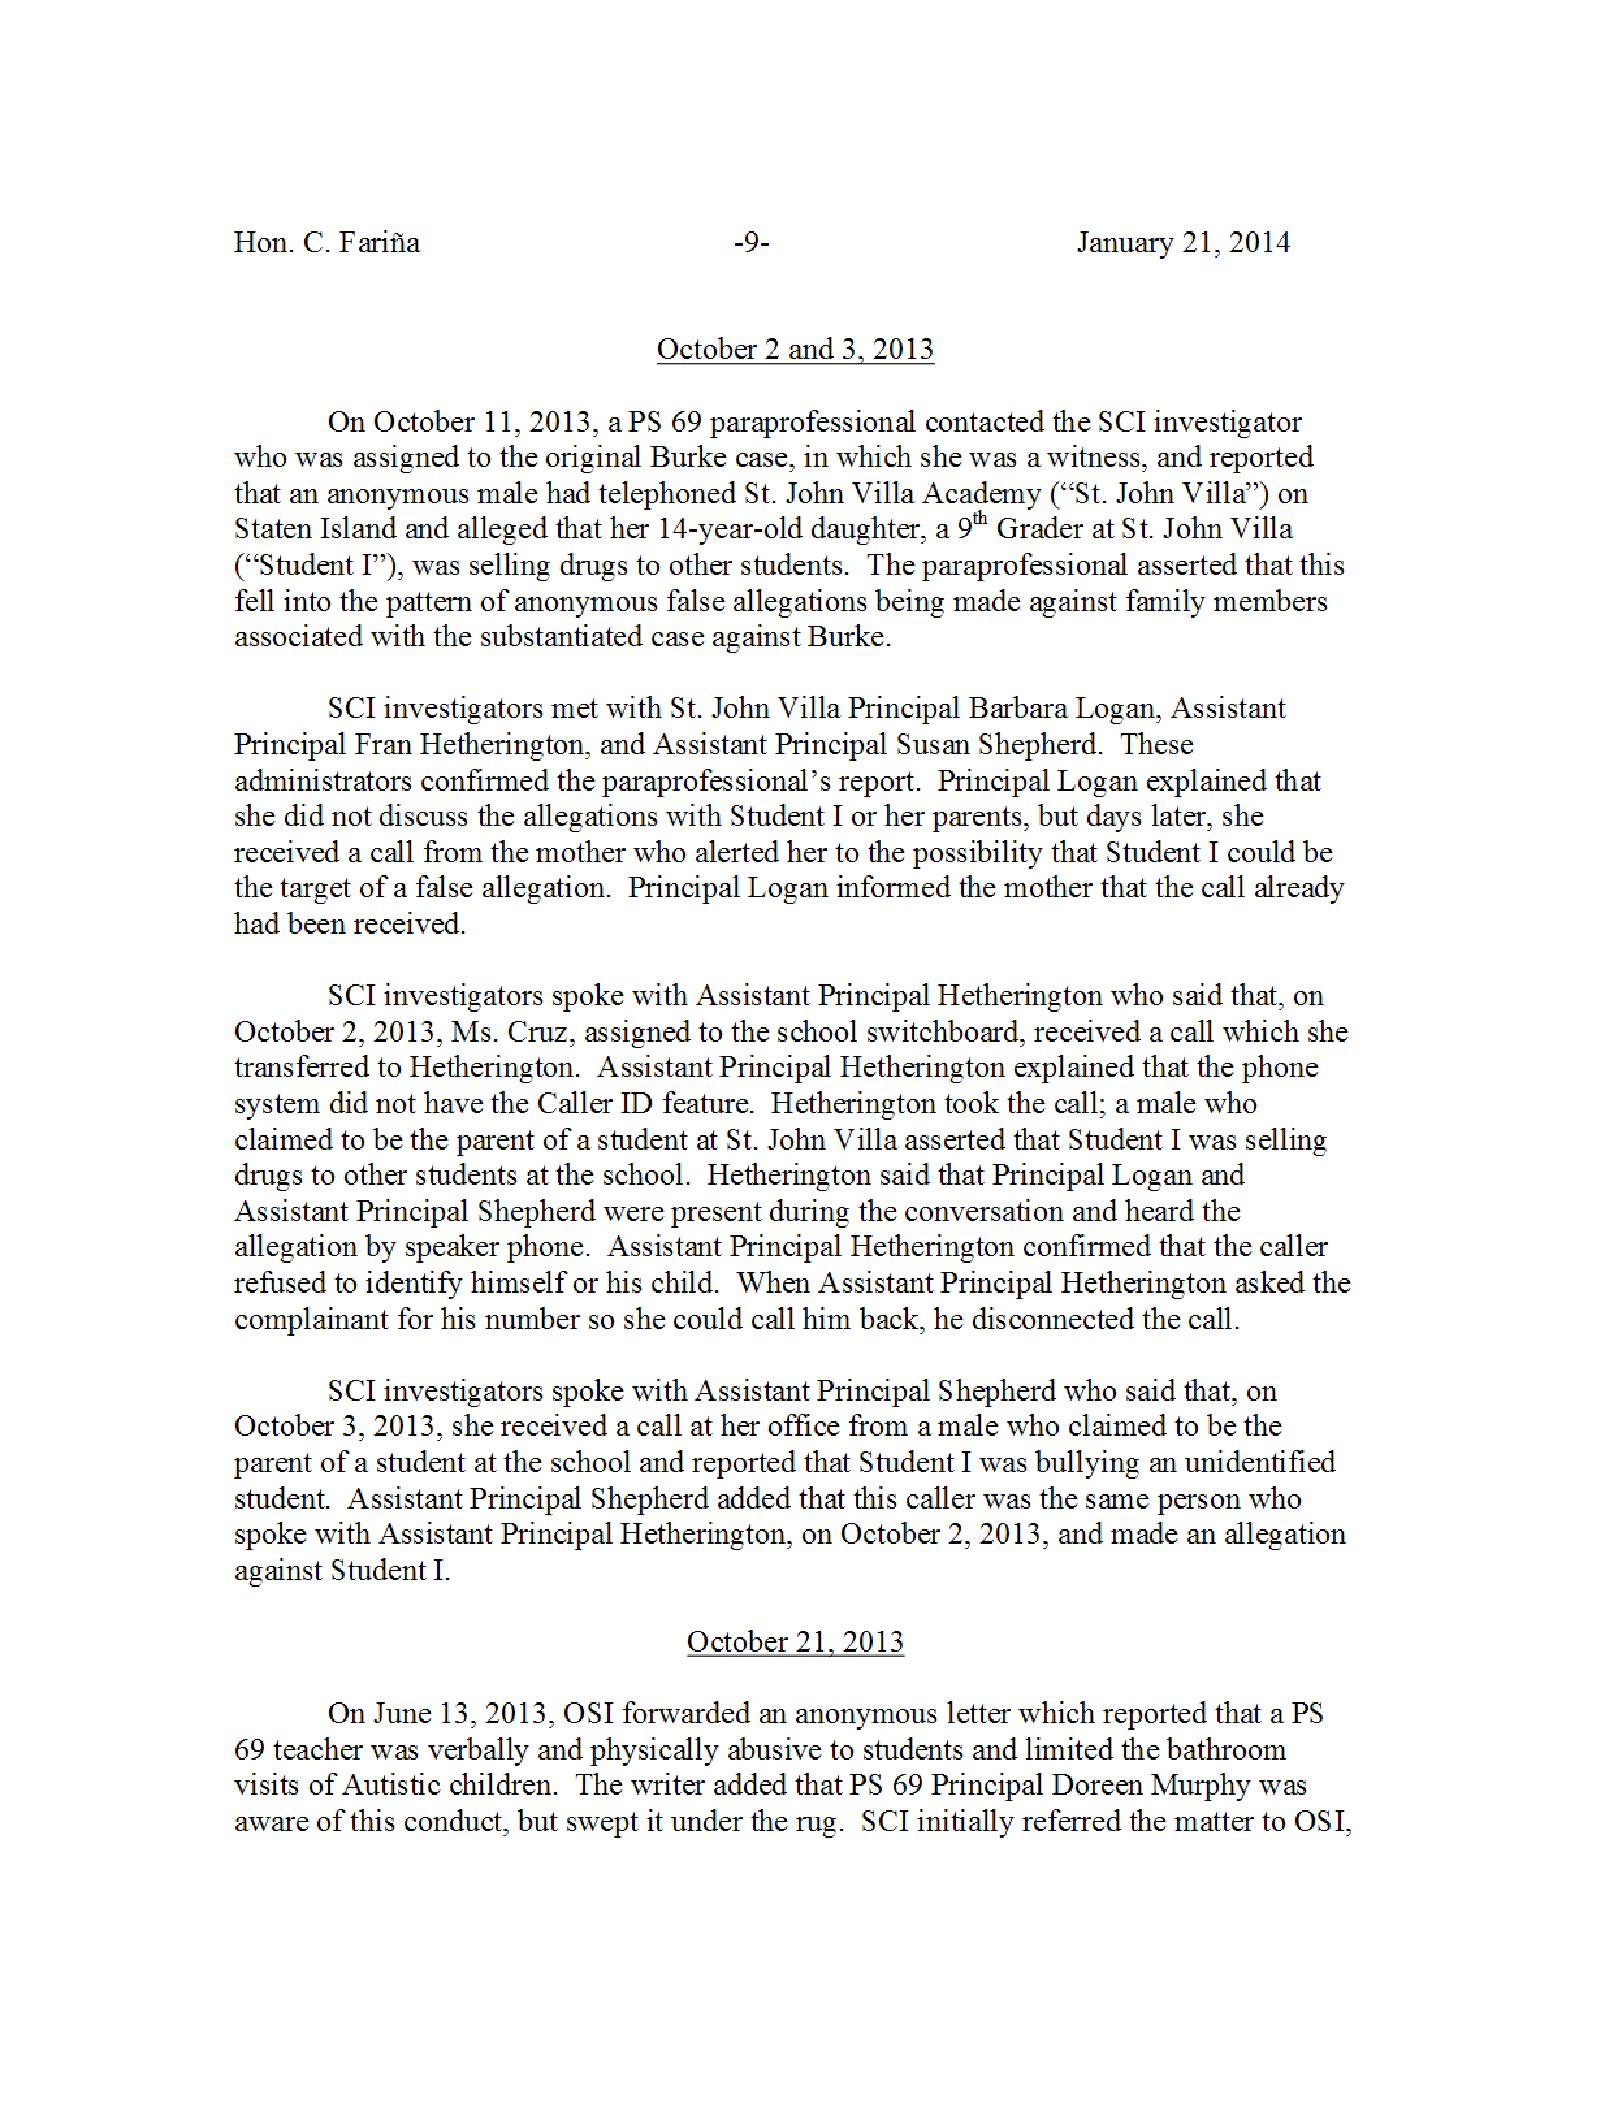 Copy of 1-22-2014 9-25-02 AM09.png